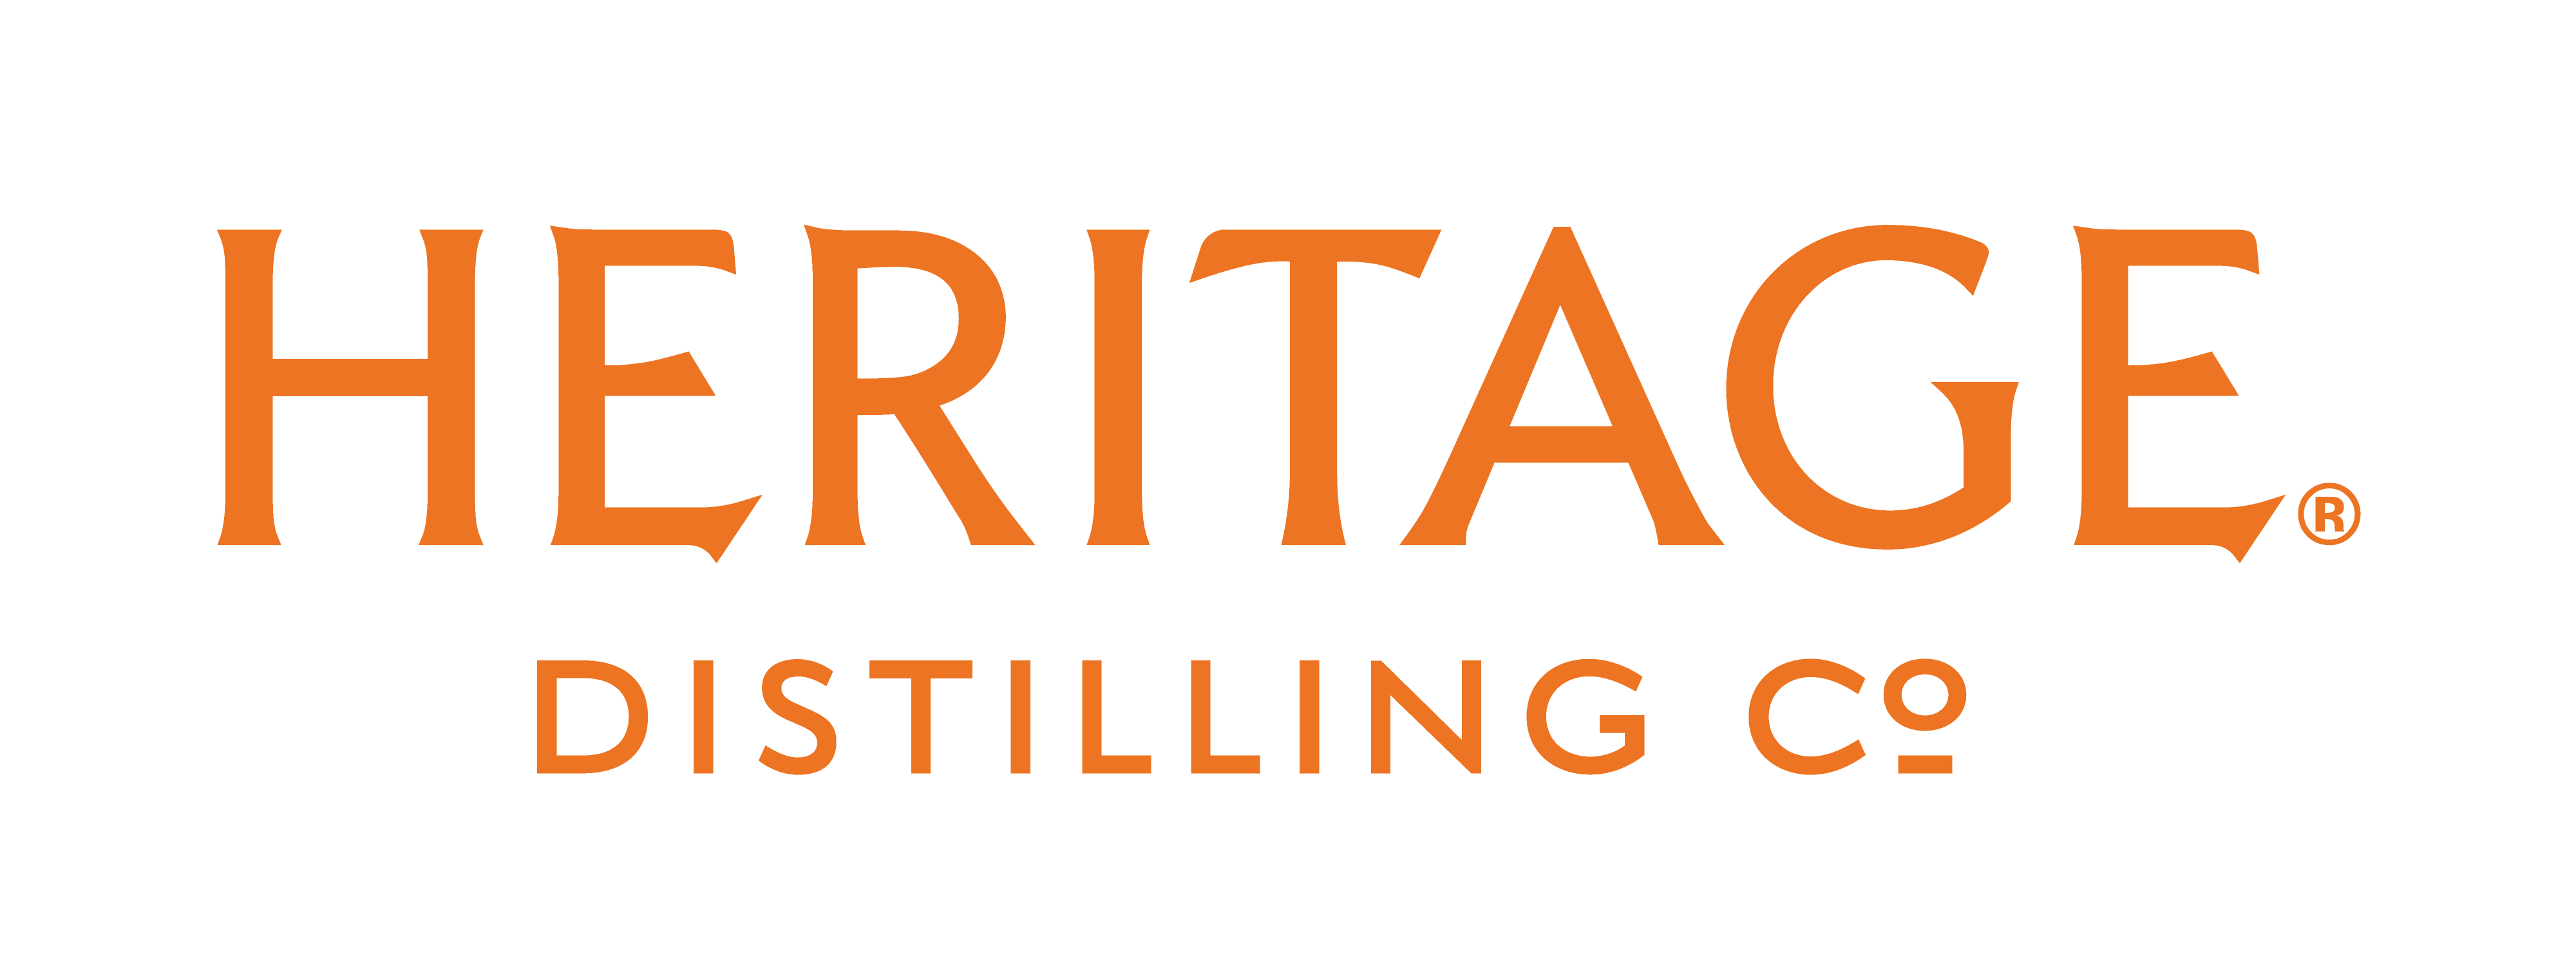 Heritage_Wordmark_Orange_Cropped